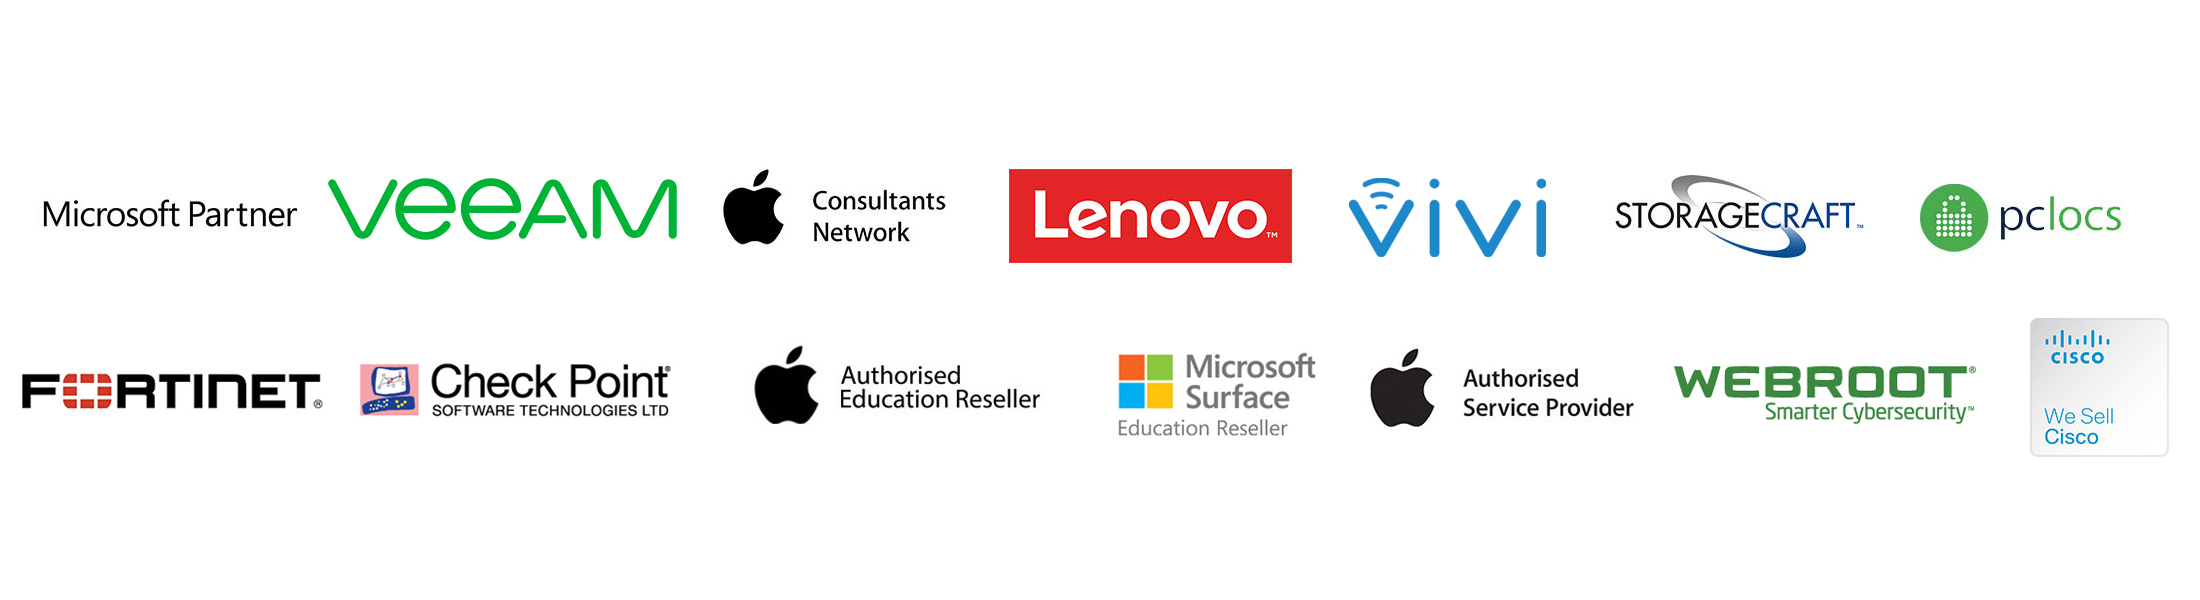 Apple Authorised Service Provider Solutions It Perth Bunbury Albany